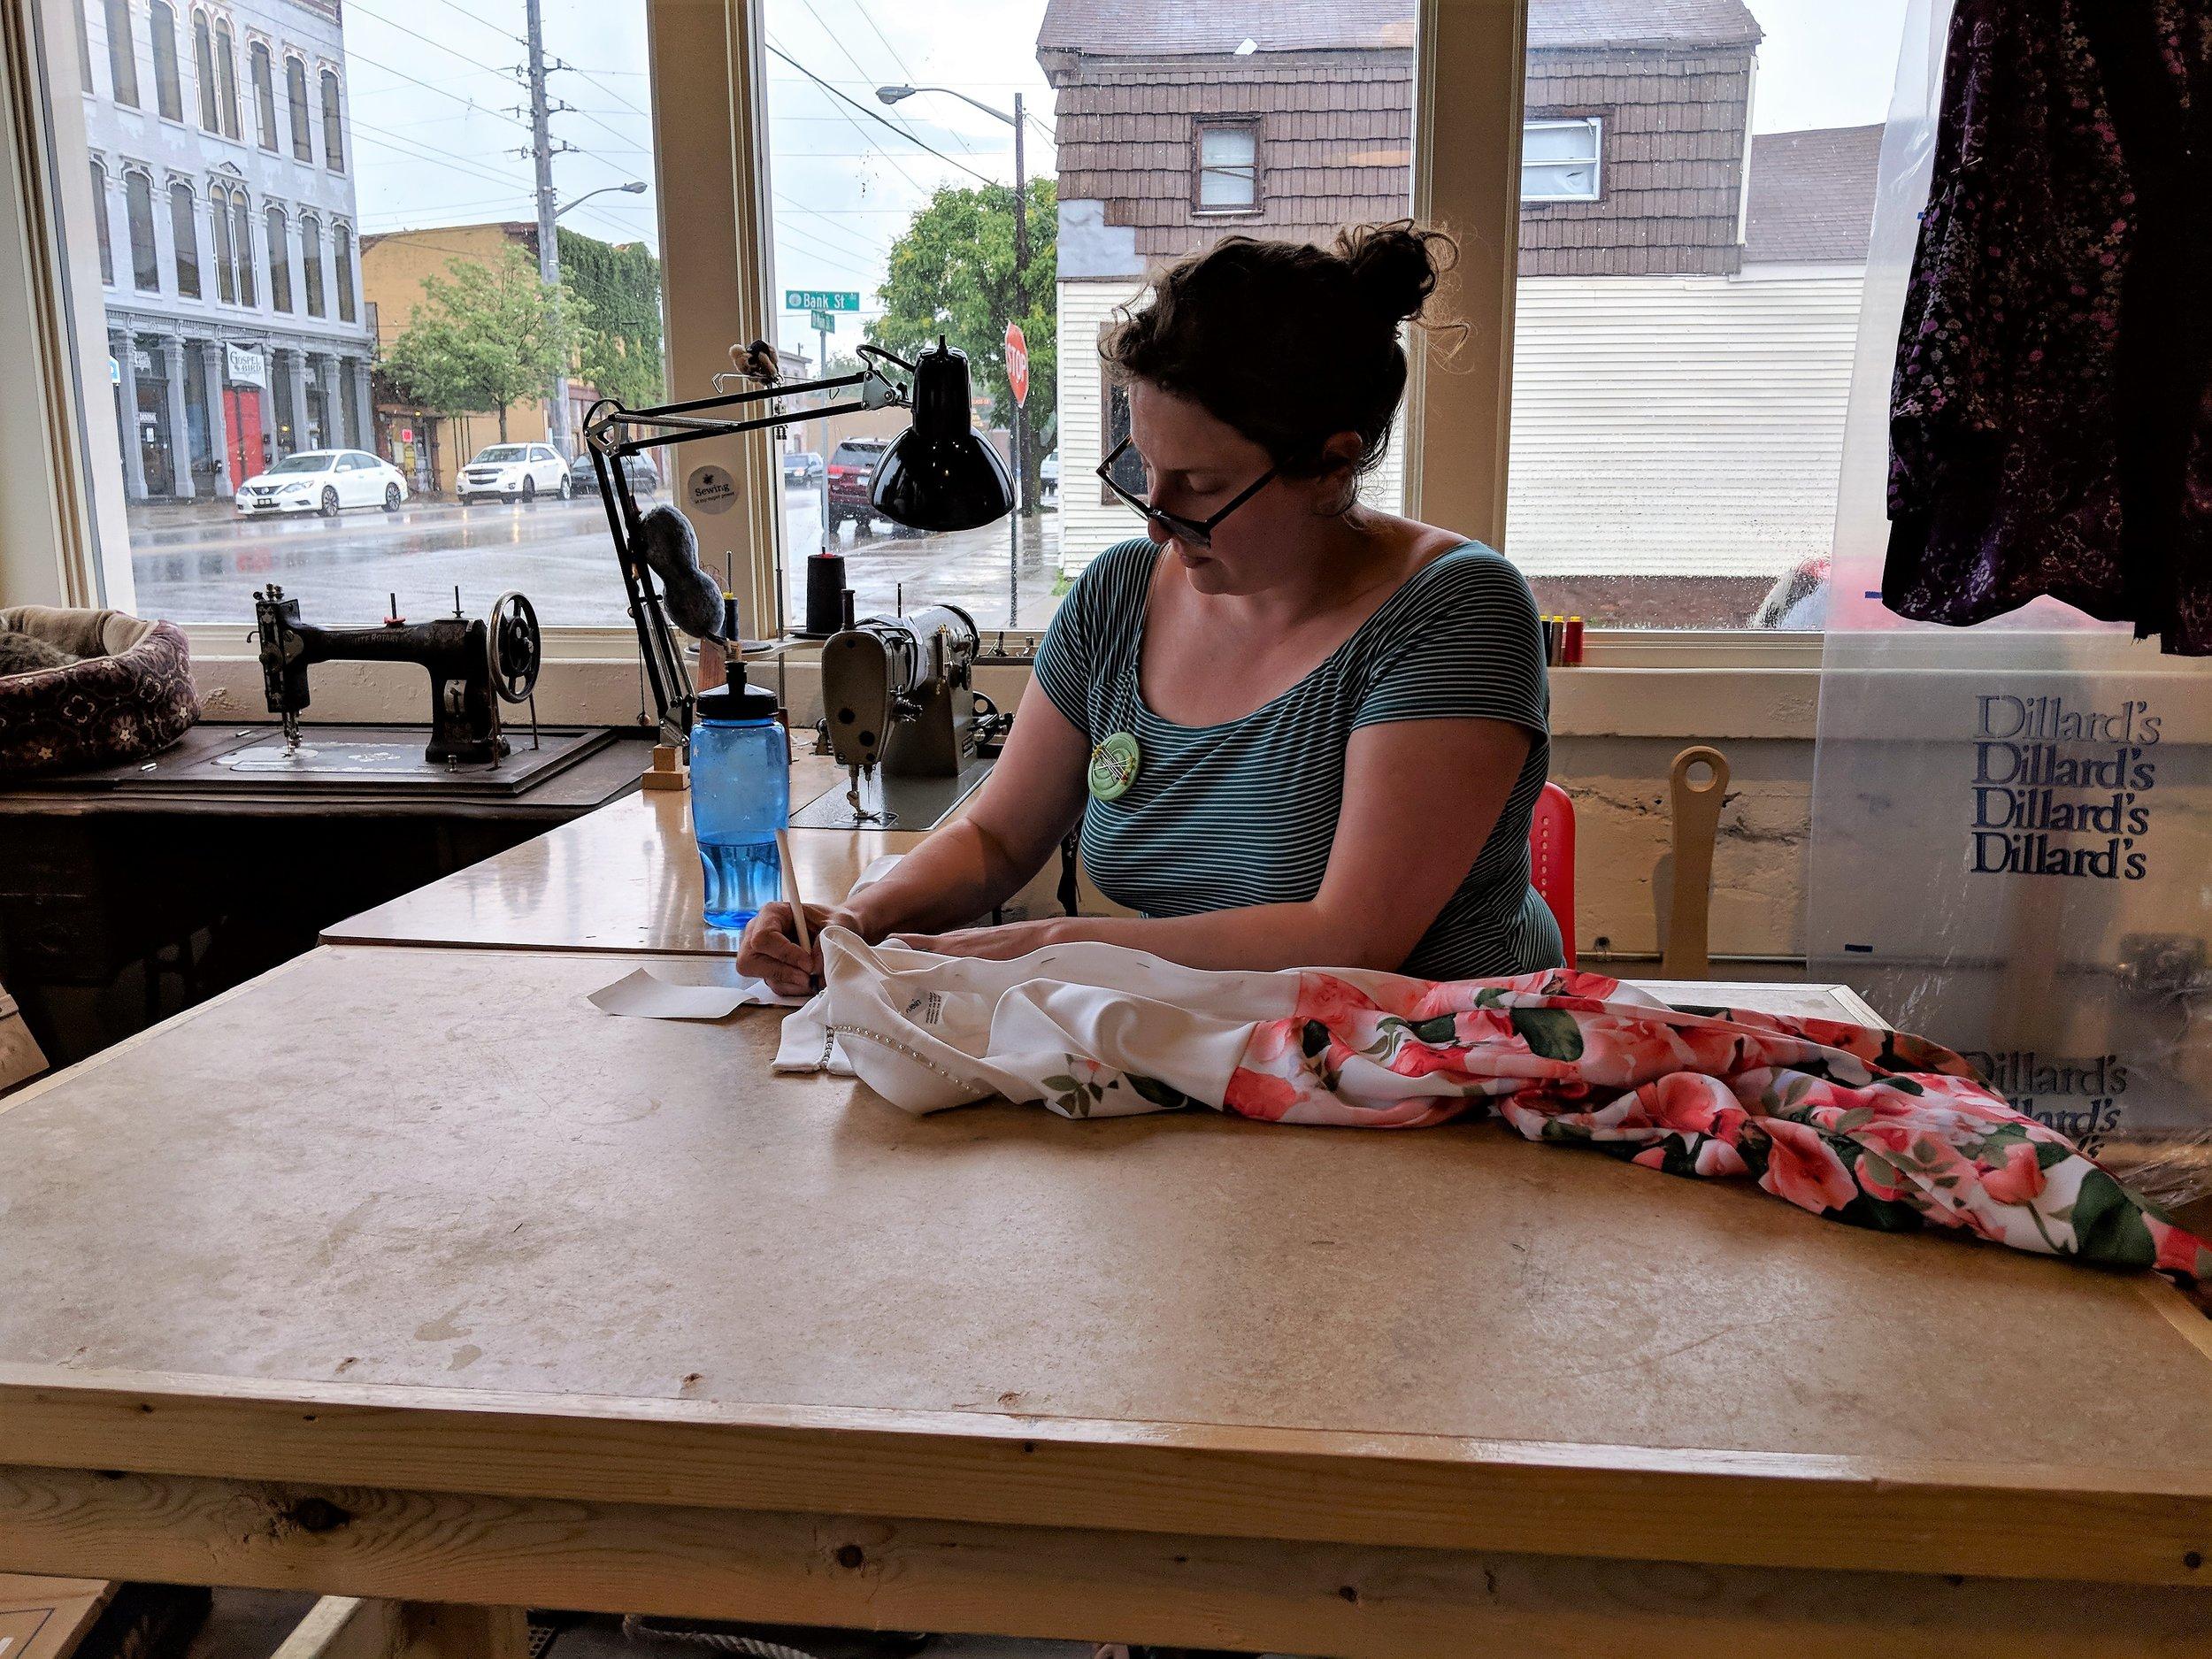 Preparing a garment for alterations